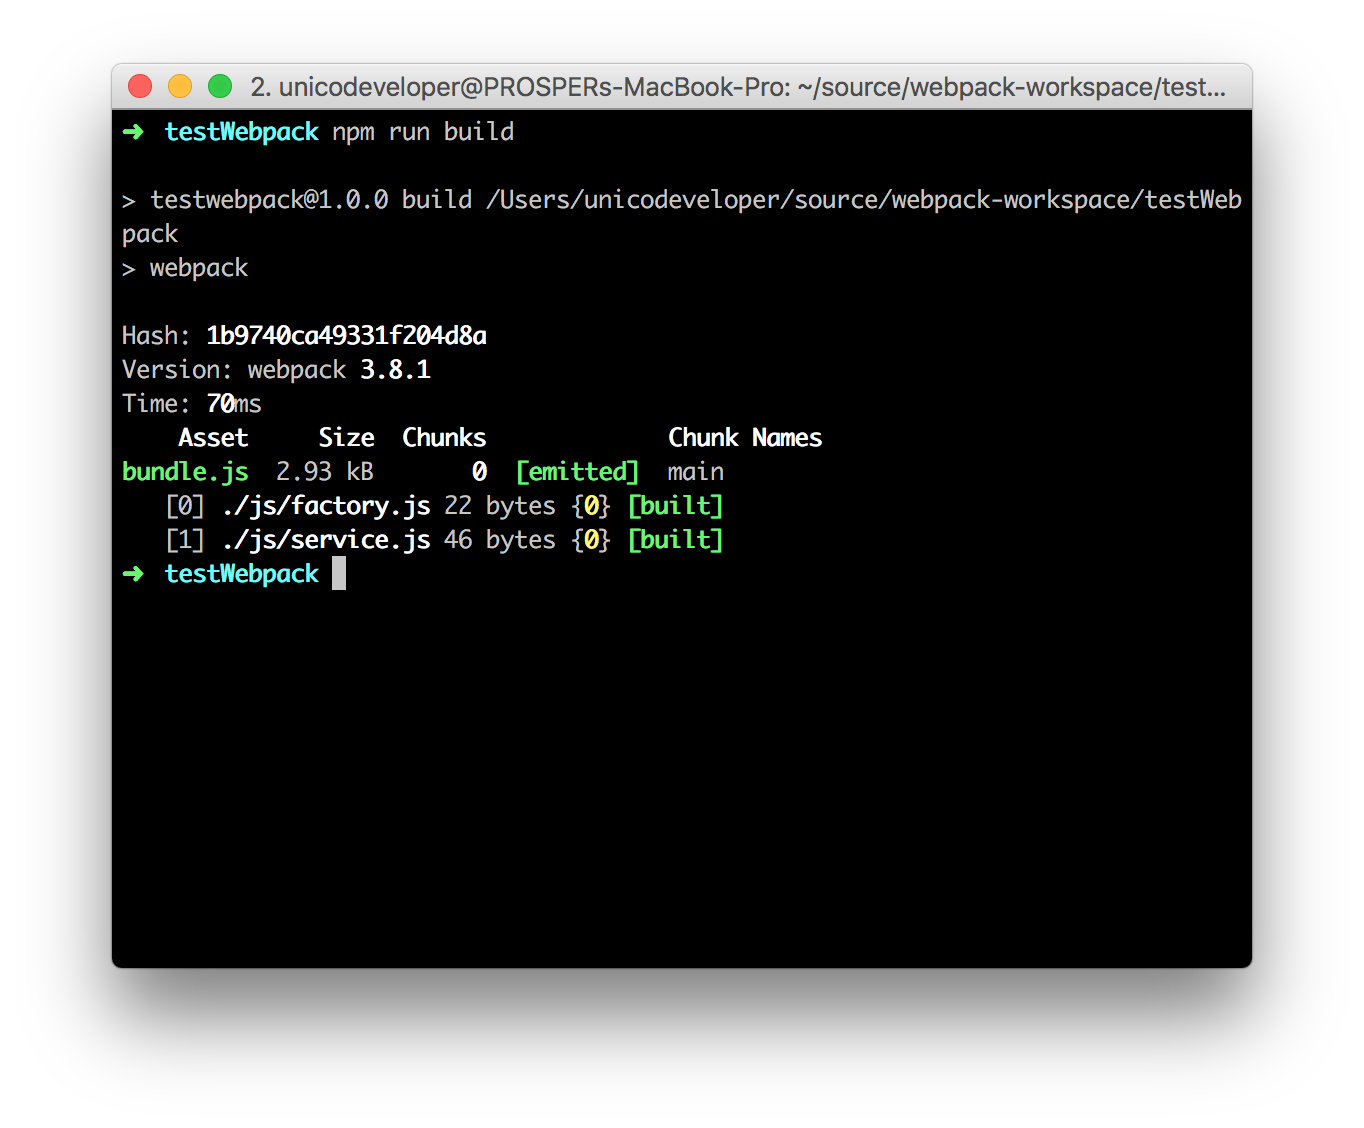 Webpack build